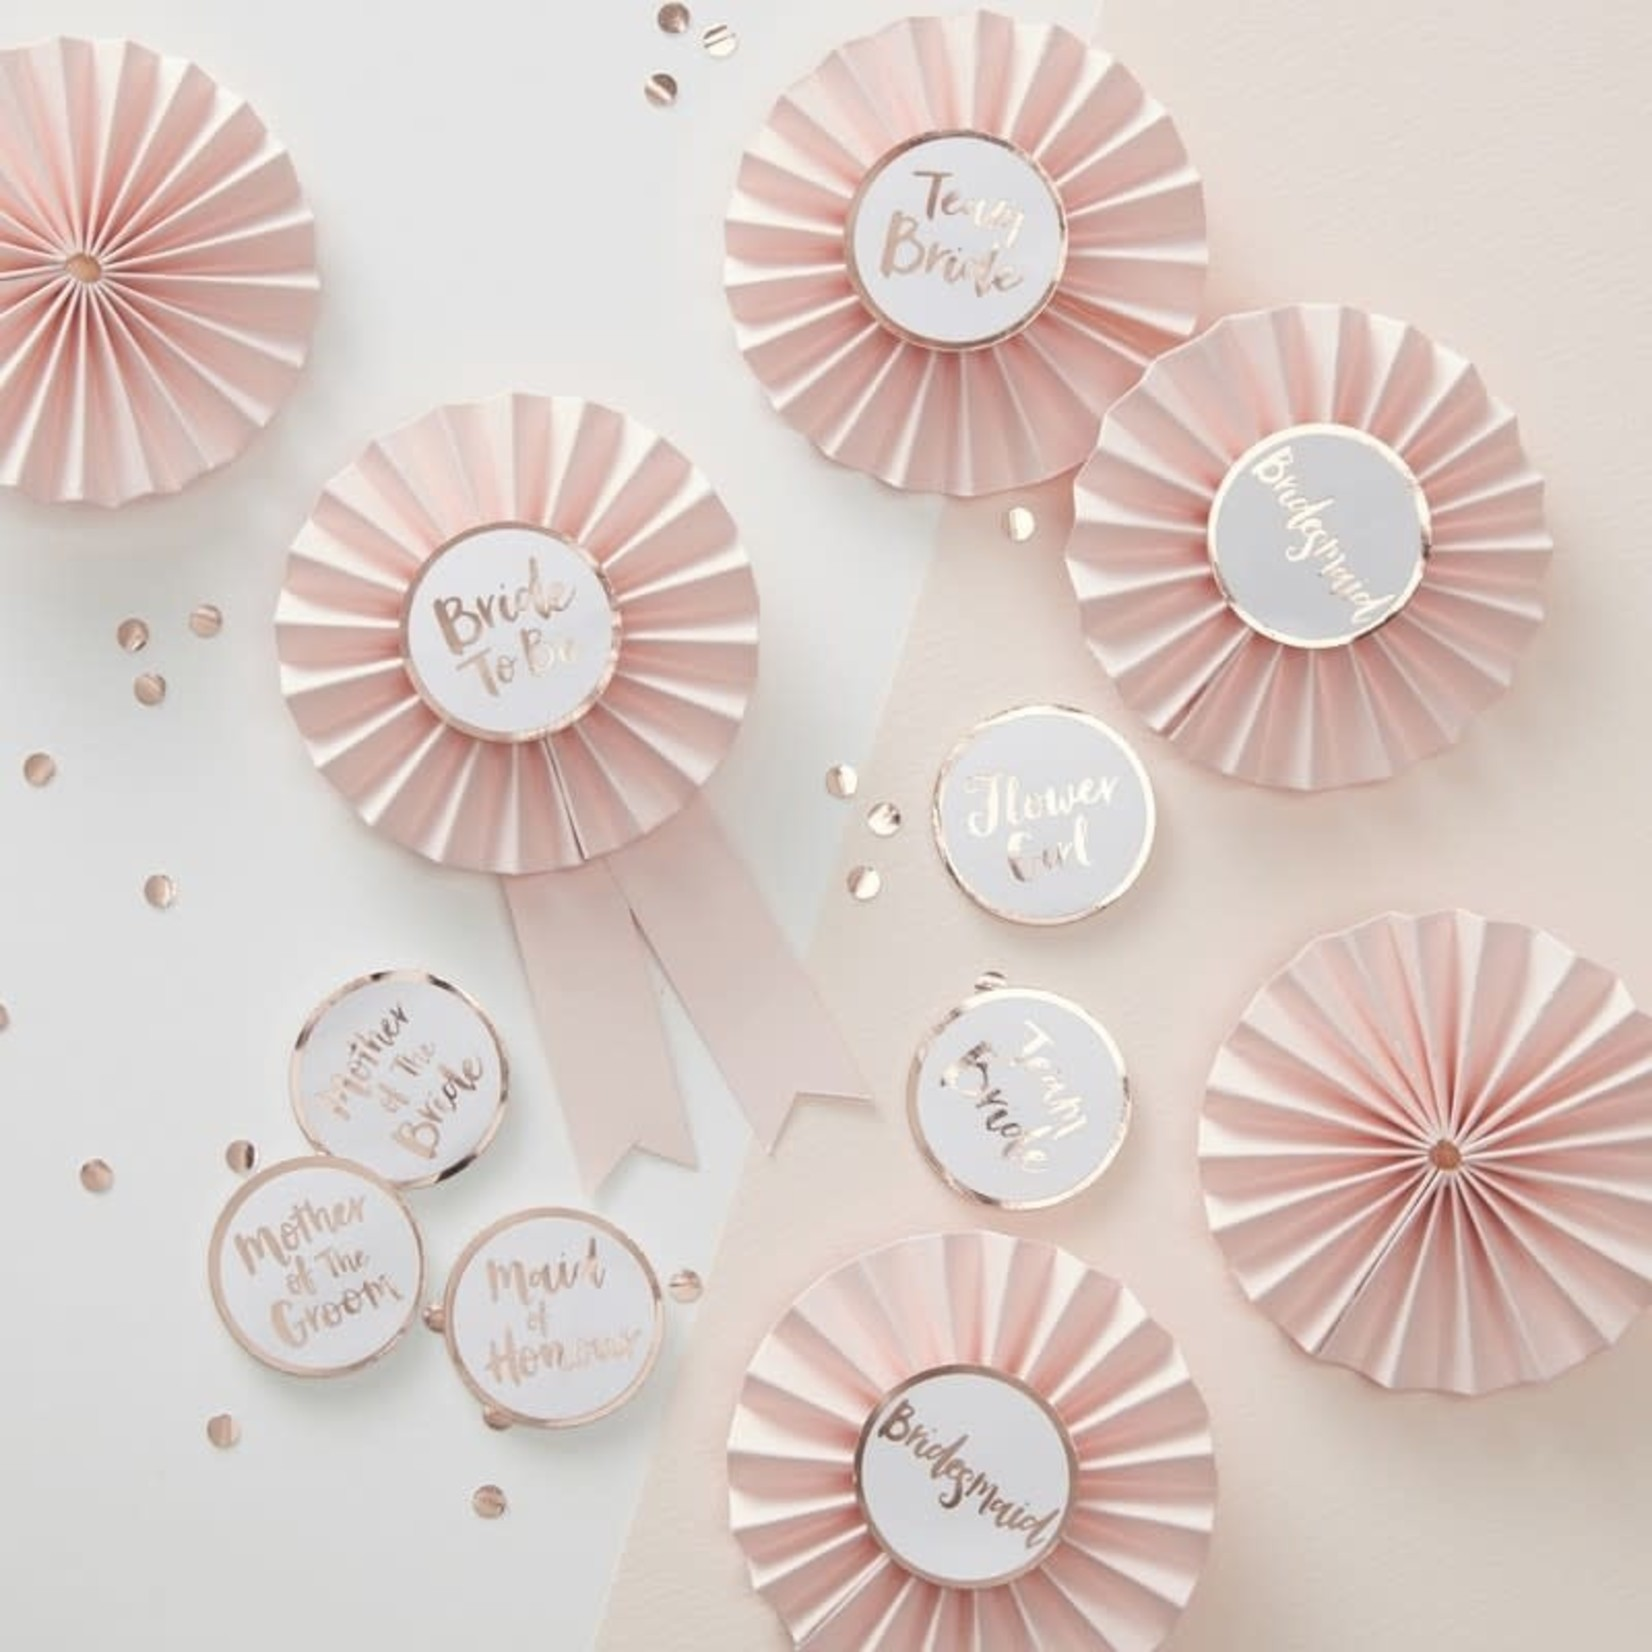 Team Bride Badges - Kit